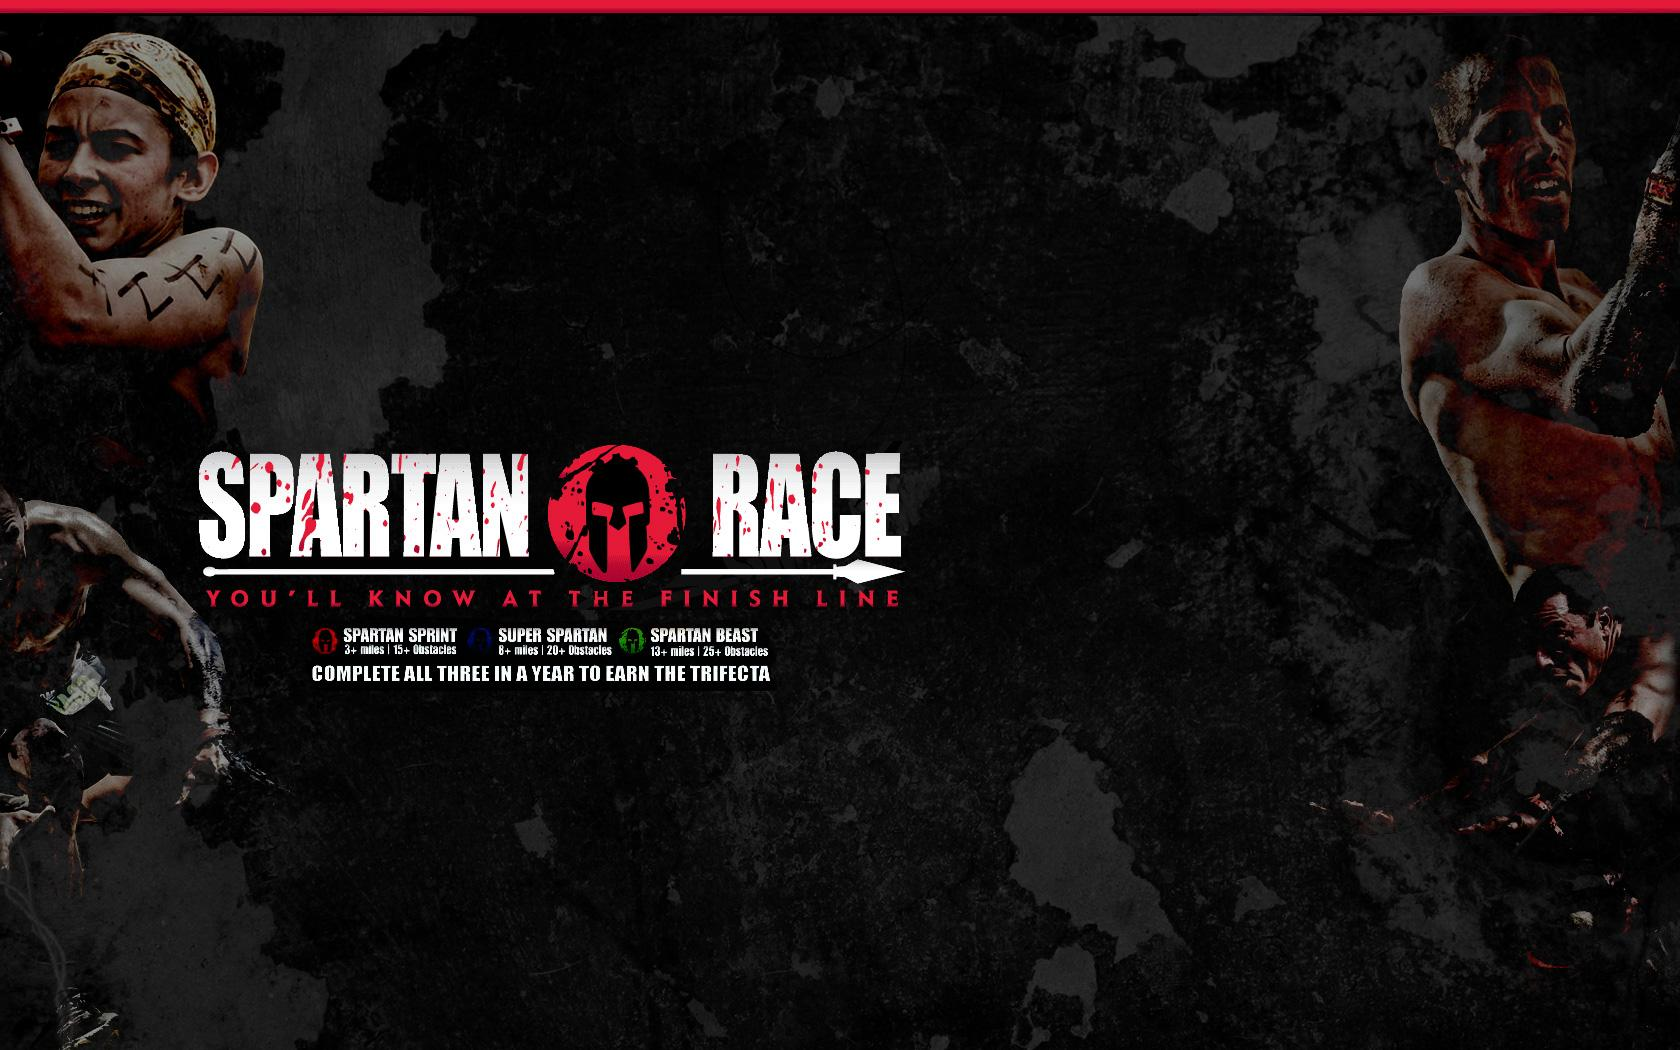 Spartan Race Hd Wallpaper Mike mckenzie spartan race 1680x1050